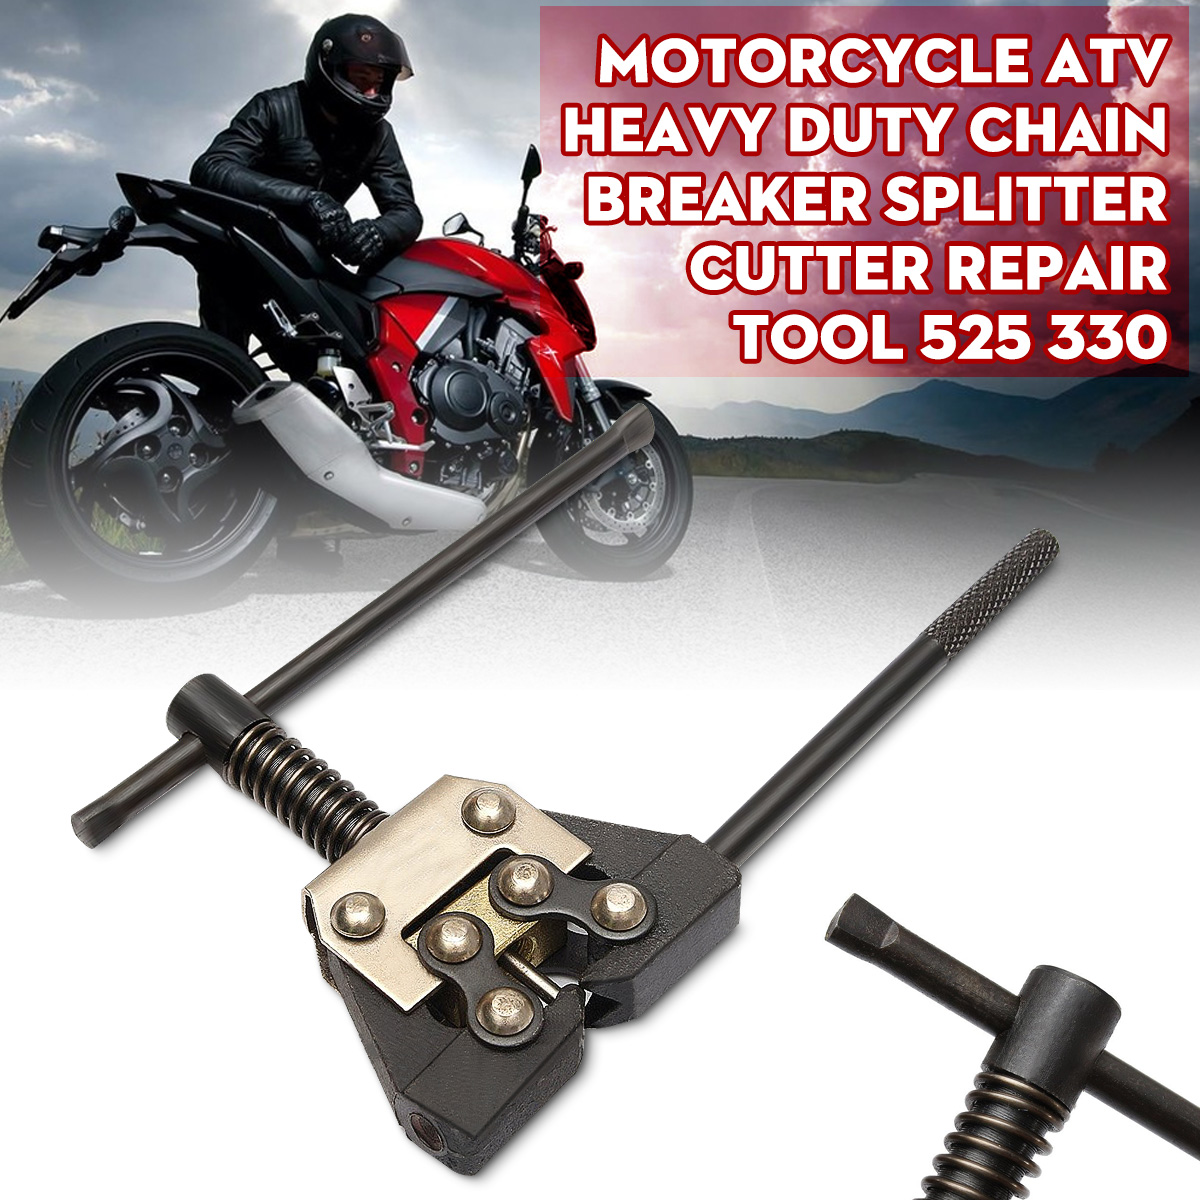 Motorcycle ATV Heavy Duty Chain Breaker Splitter Cutter Repair Tool 525 330